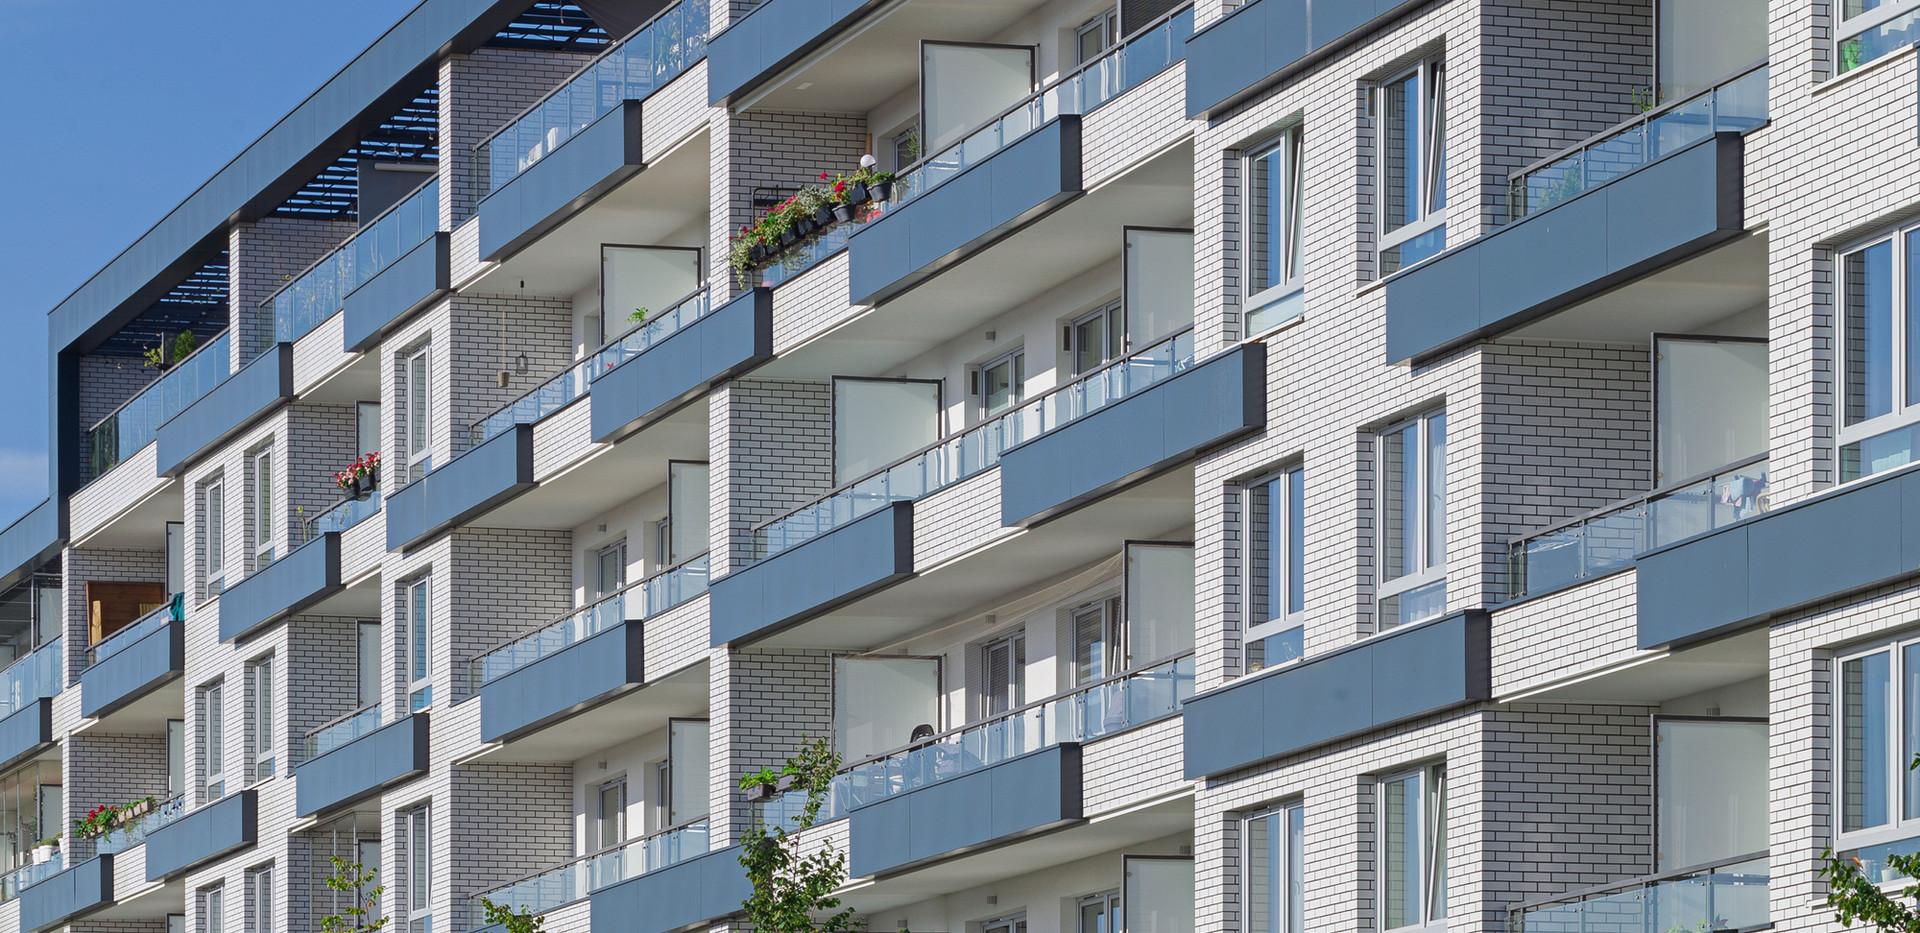 The Kwadrat Apartments